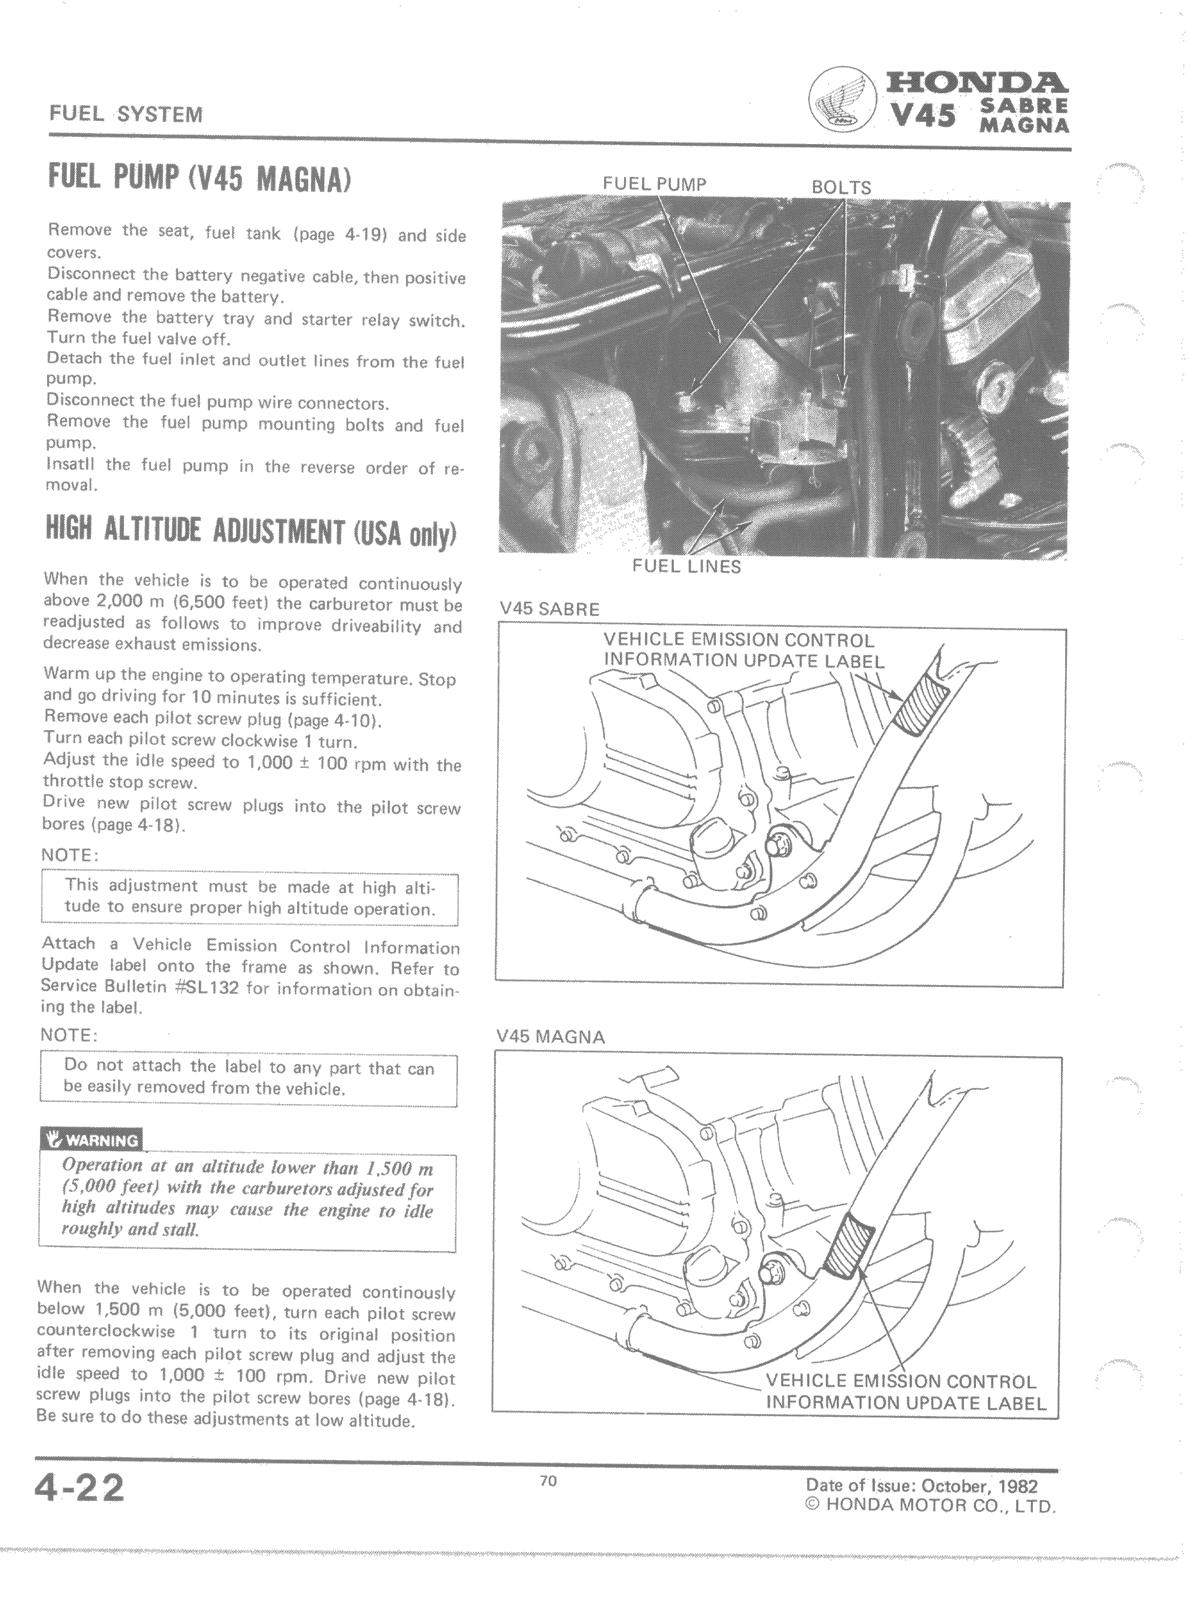 bassendackwards honda  fuel pump high altitude adjustment